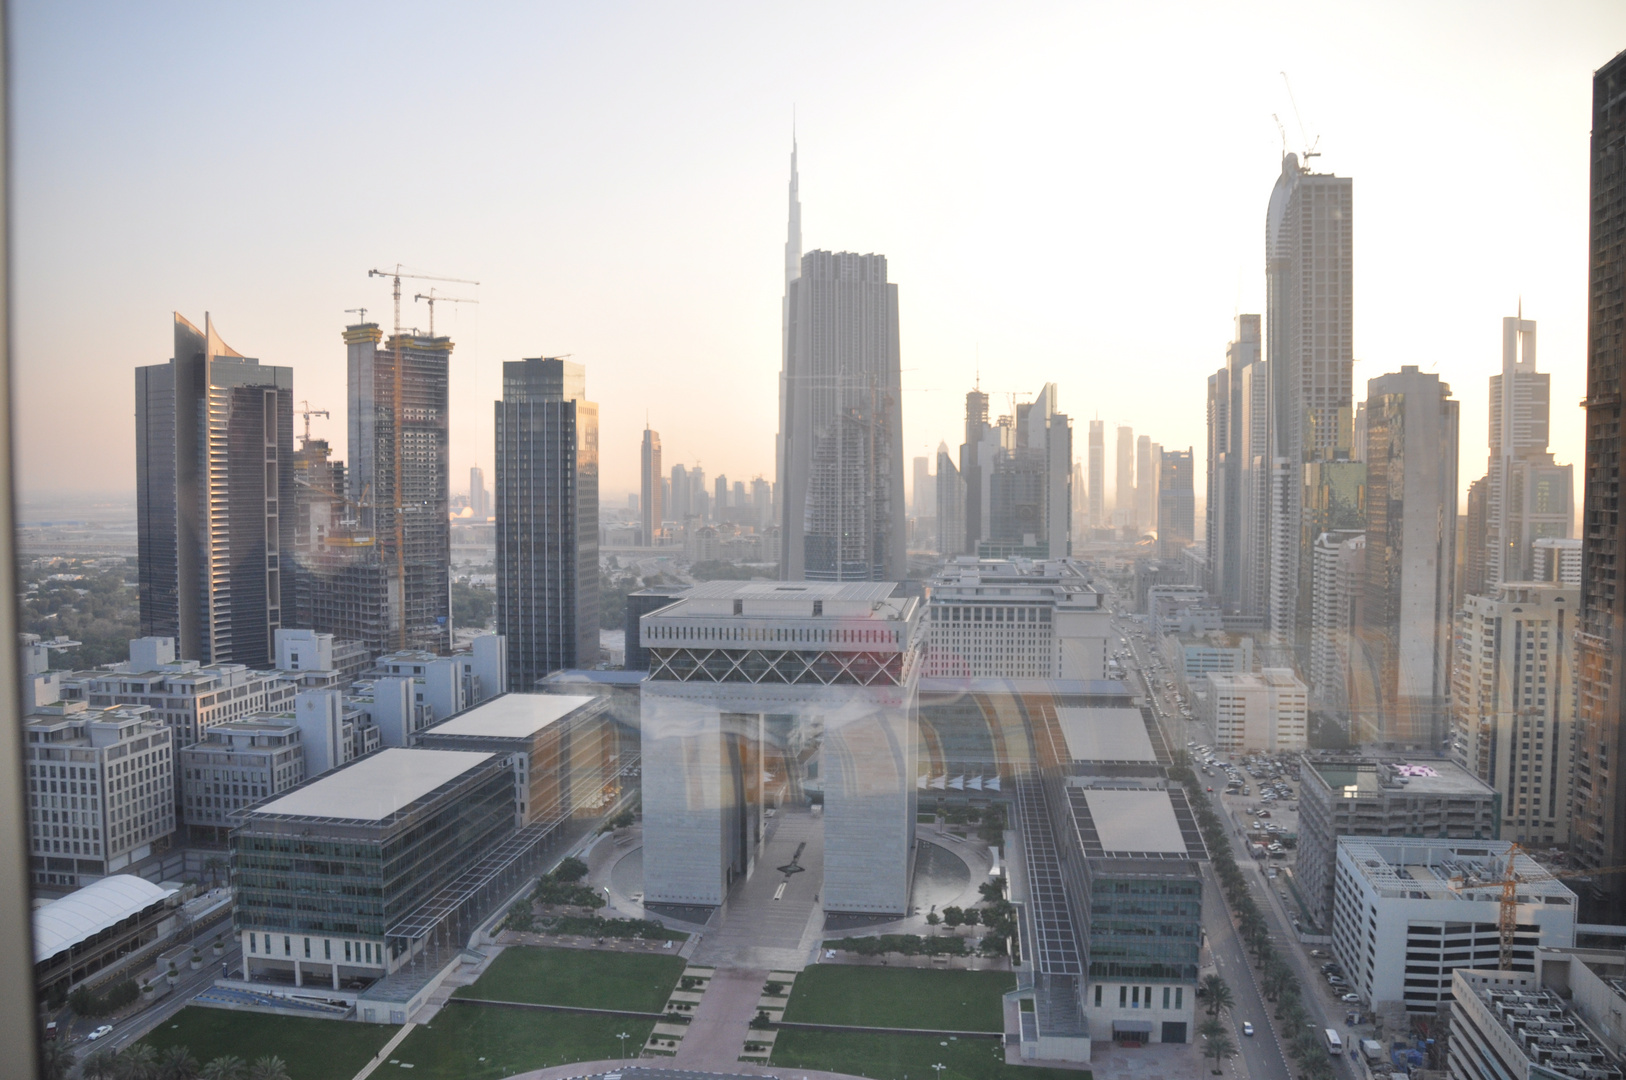 Dubai - little Manhattan